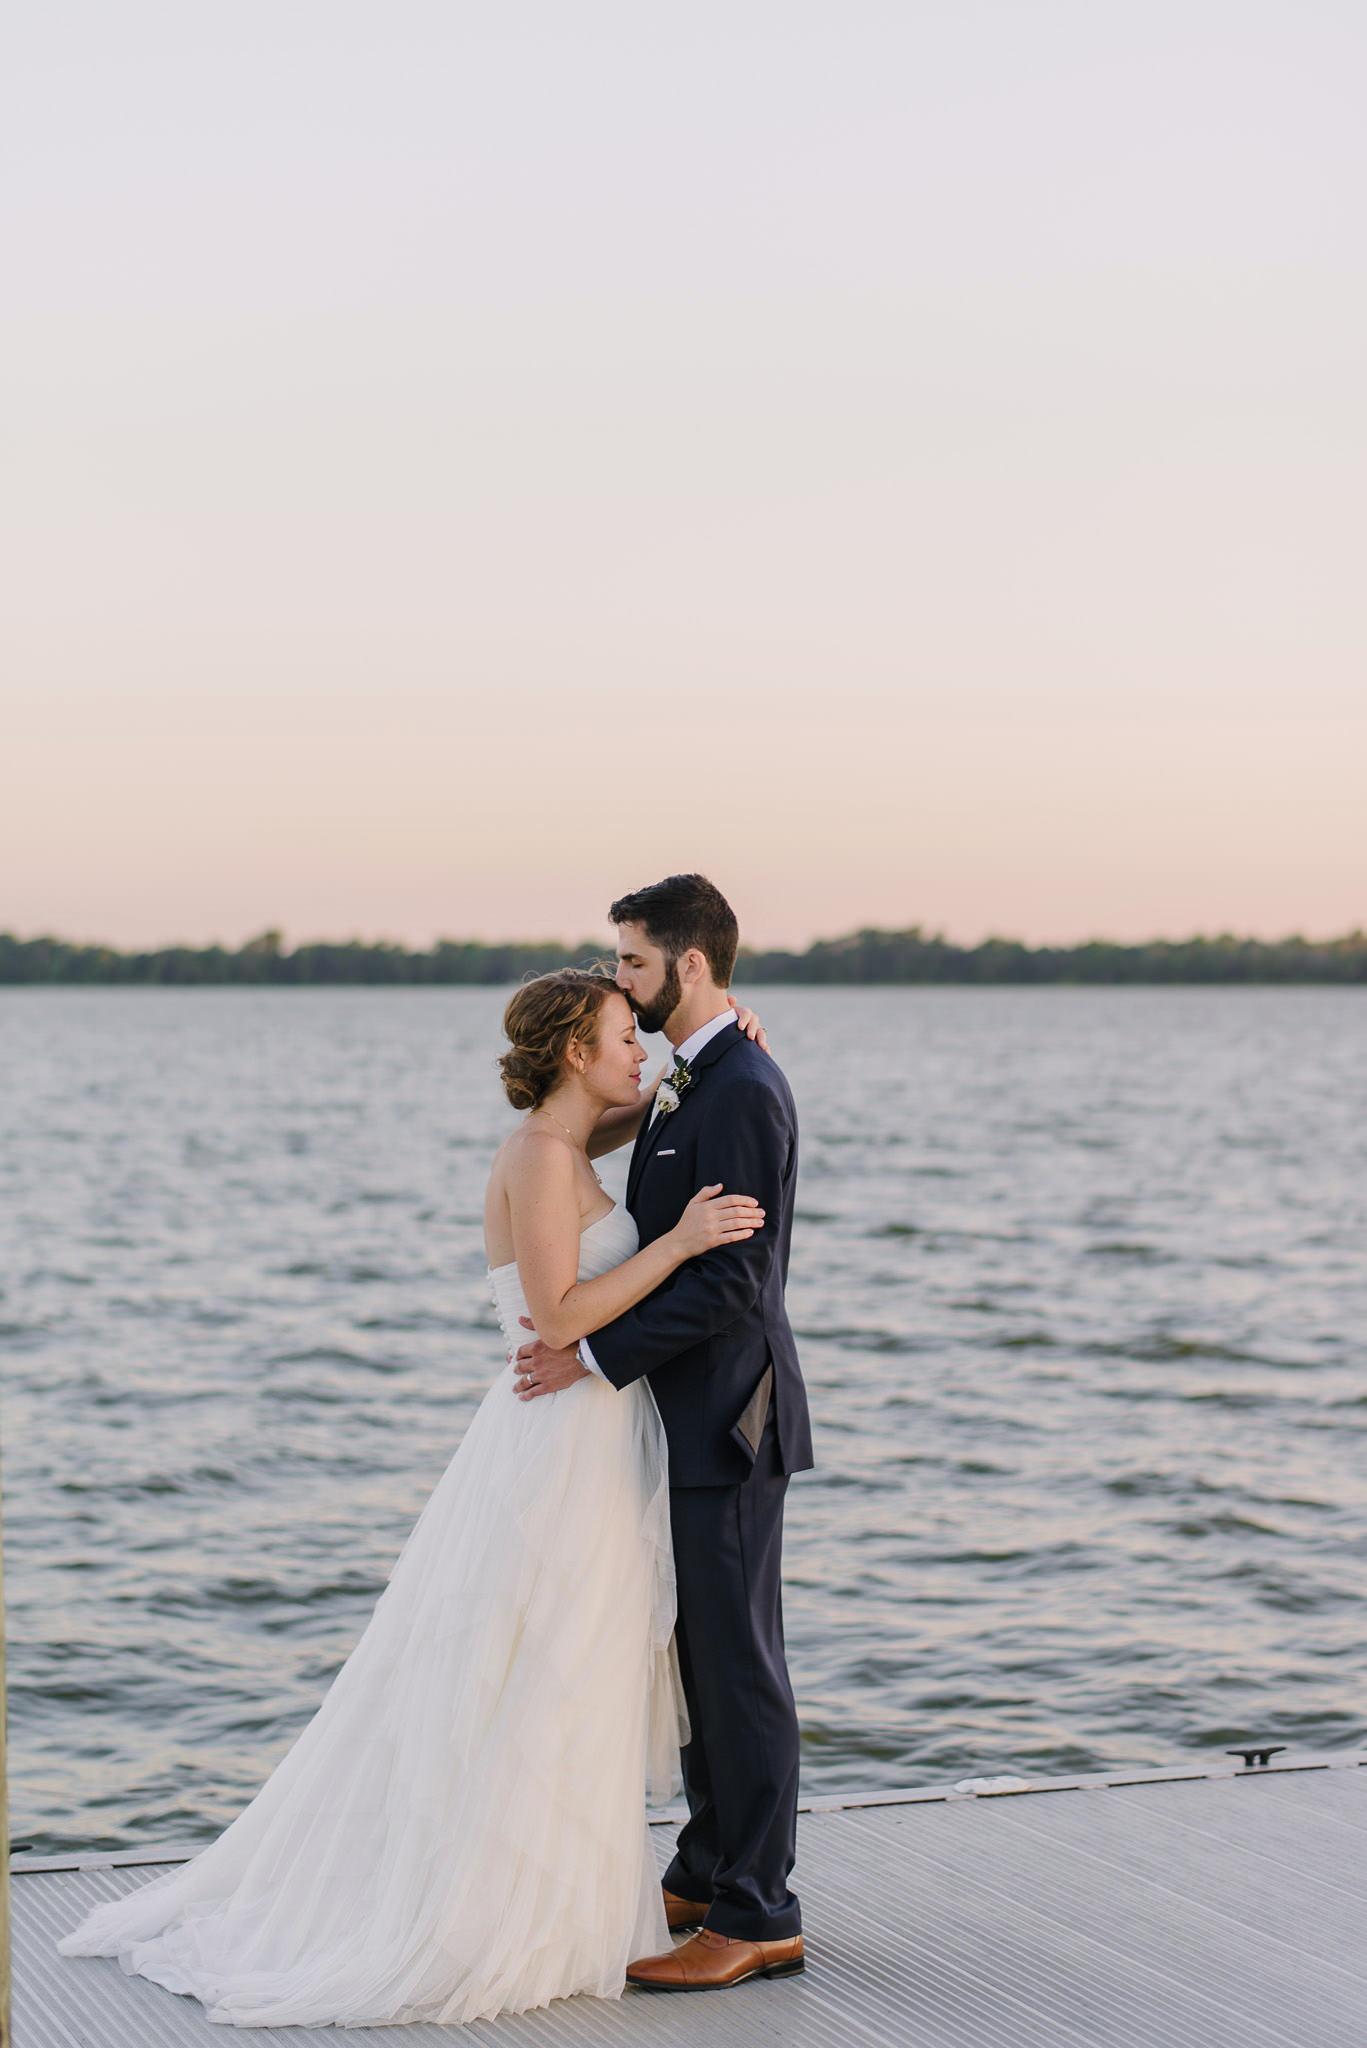 Tavares+Pavilion+on+the+Lake+Wedding+Florida_037.jpg